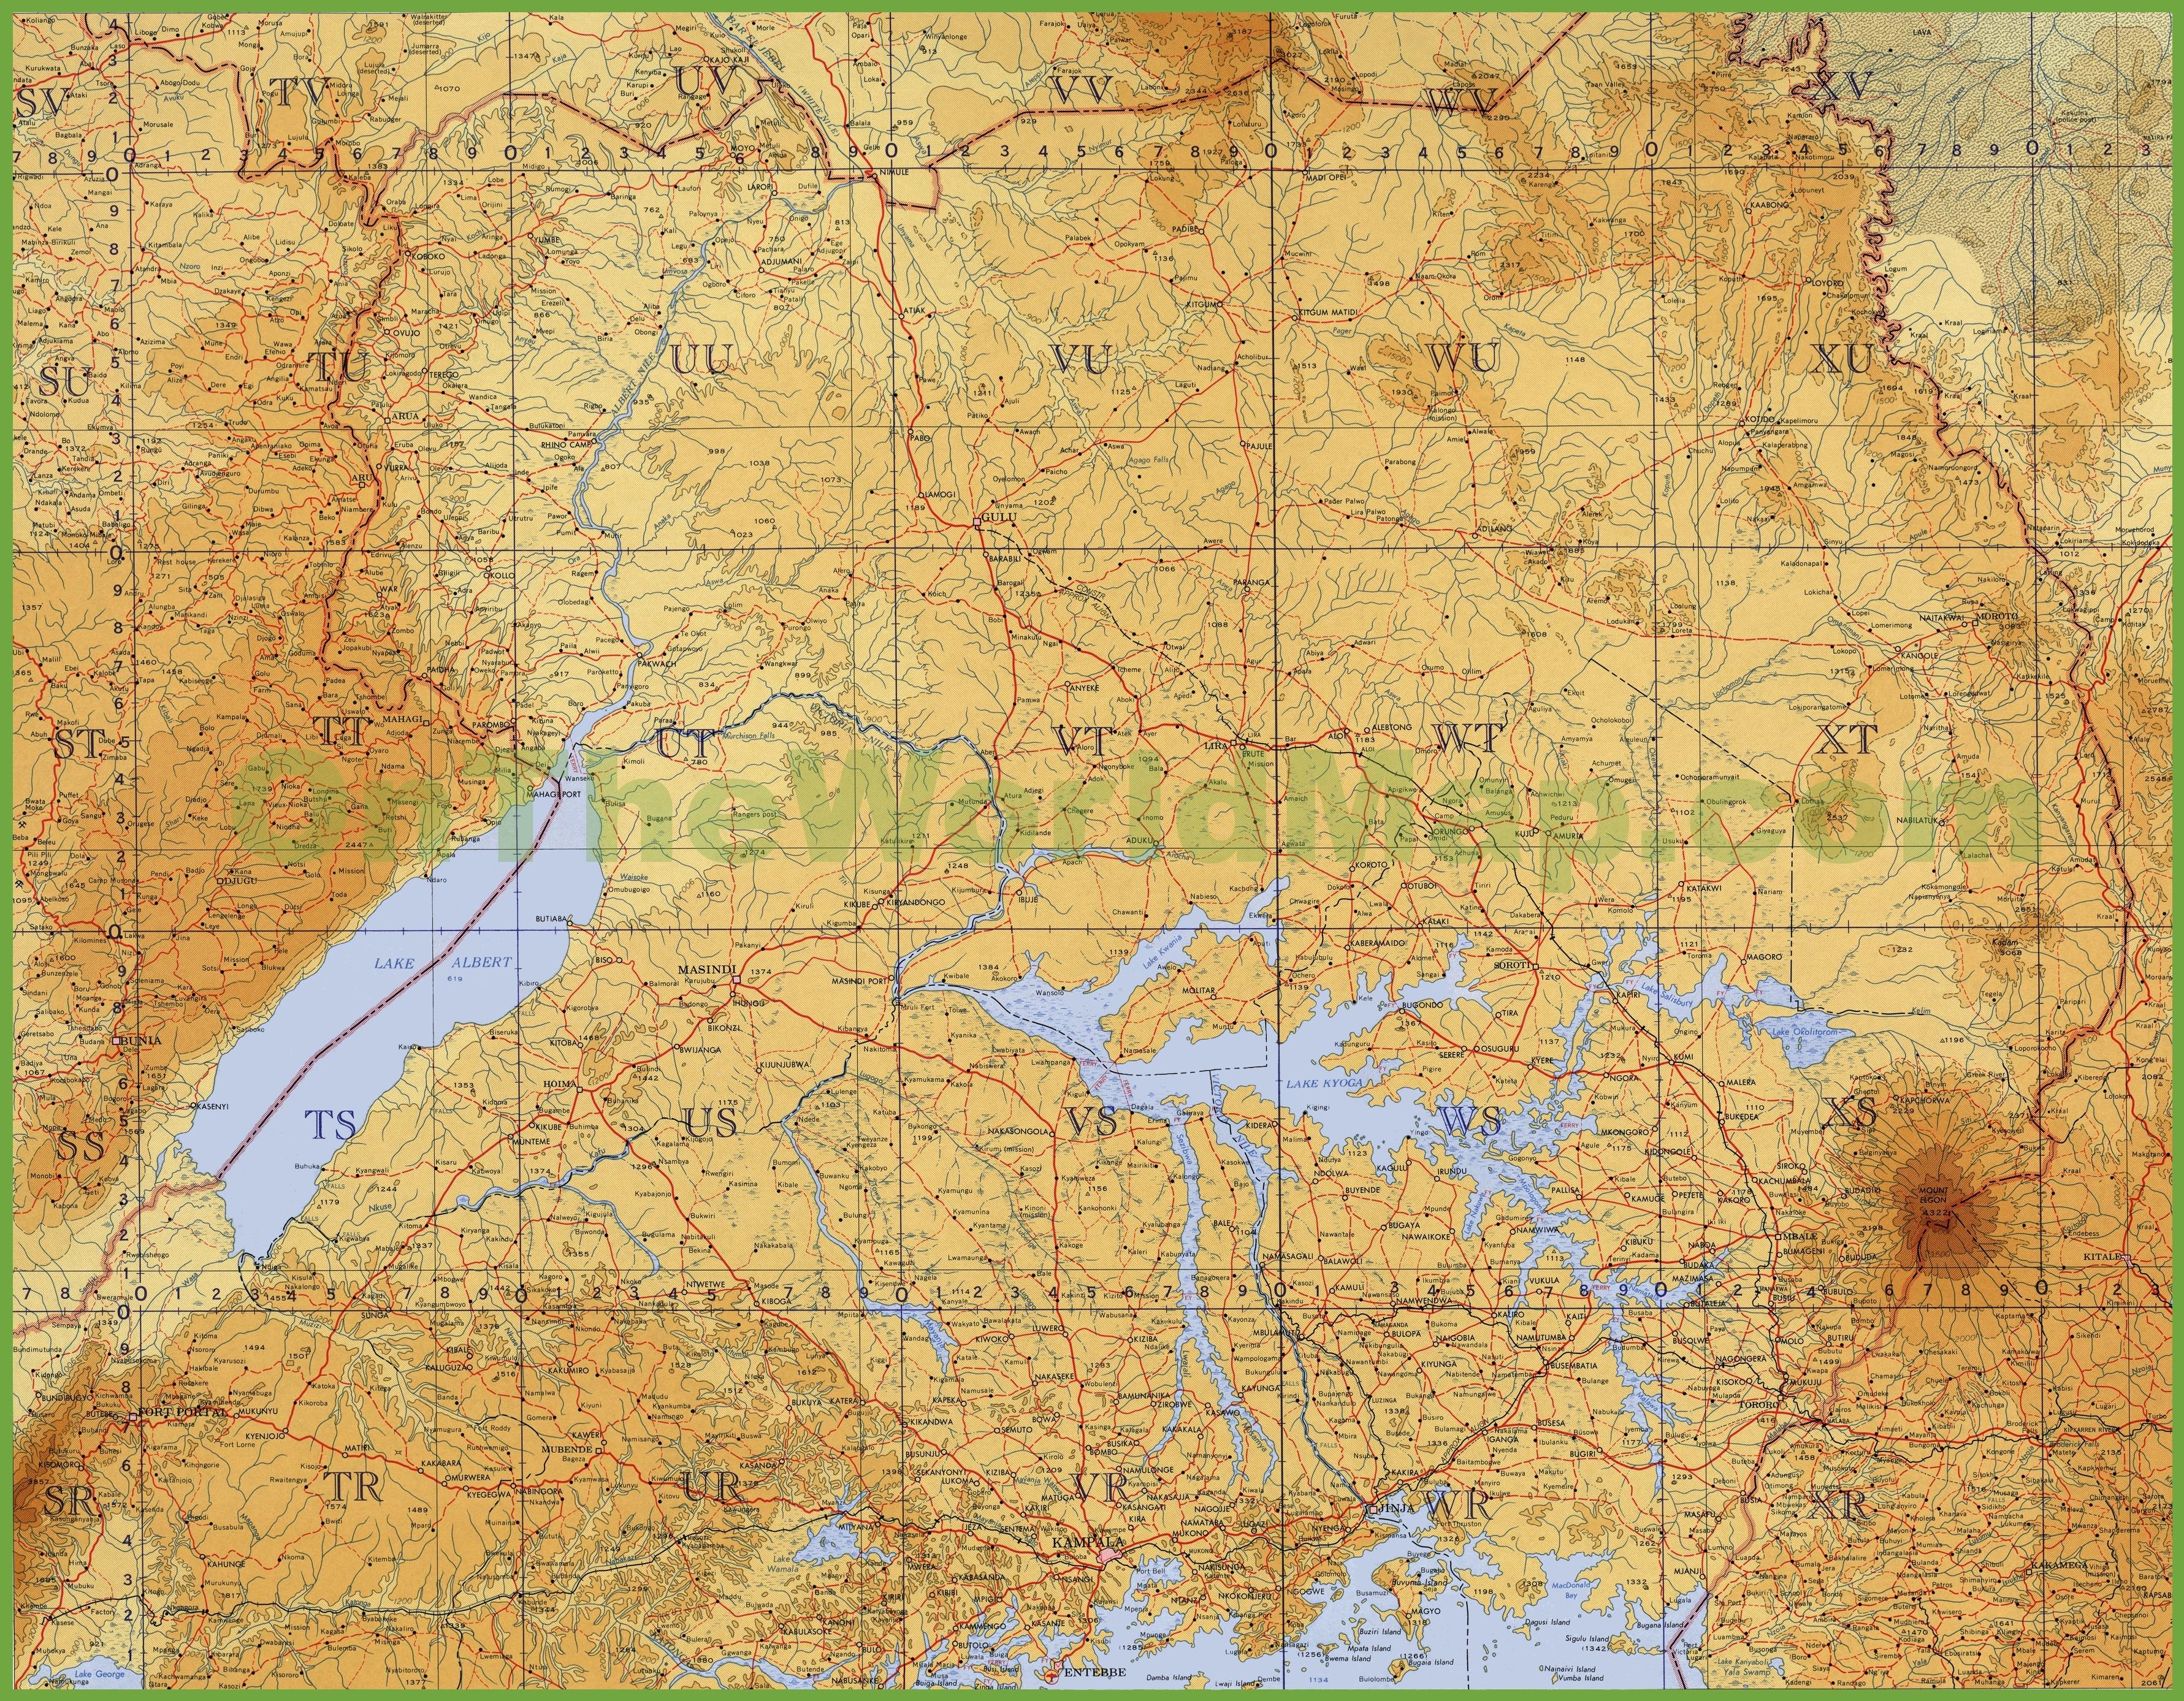 Topographic map of Uganda